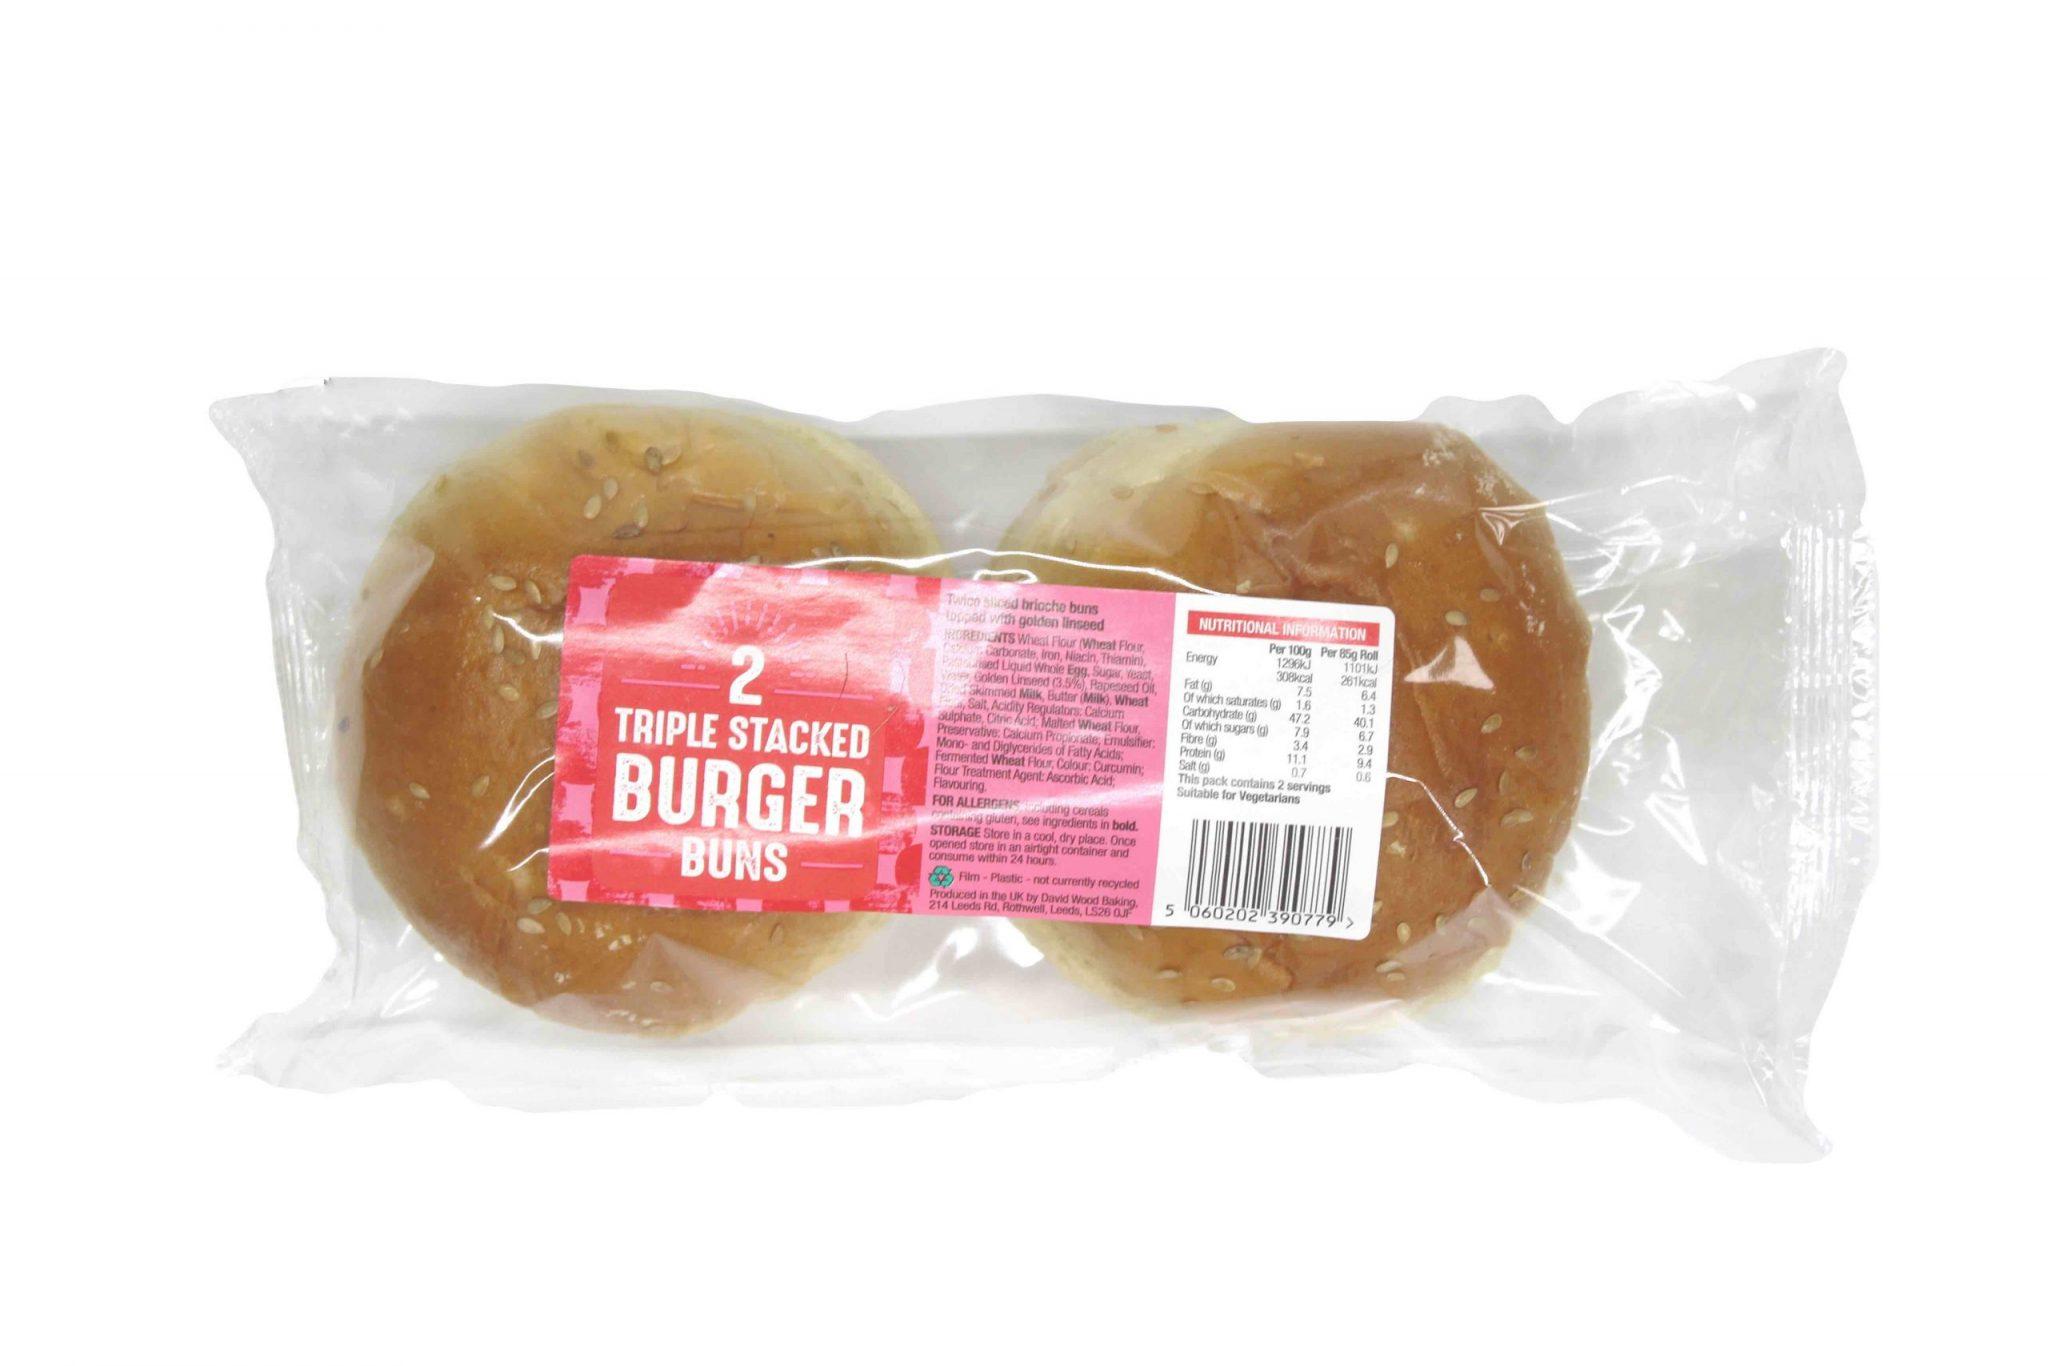 Triple Stacker Burger